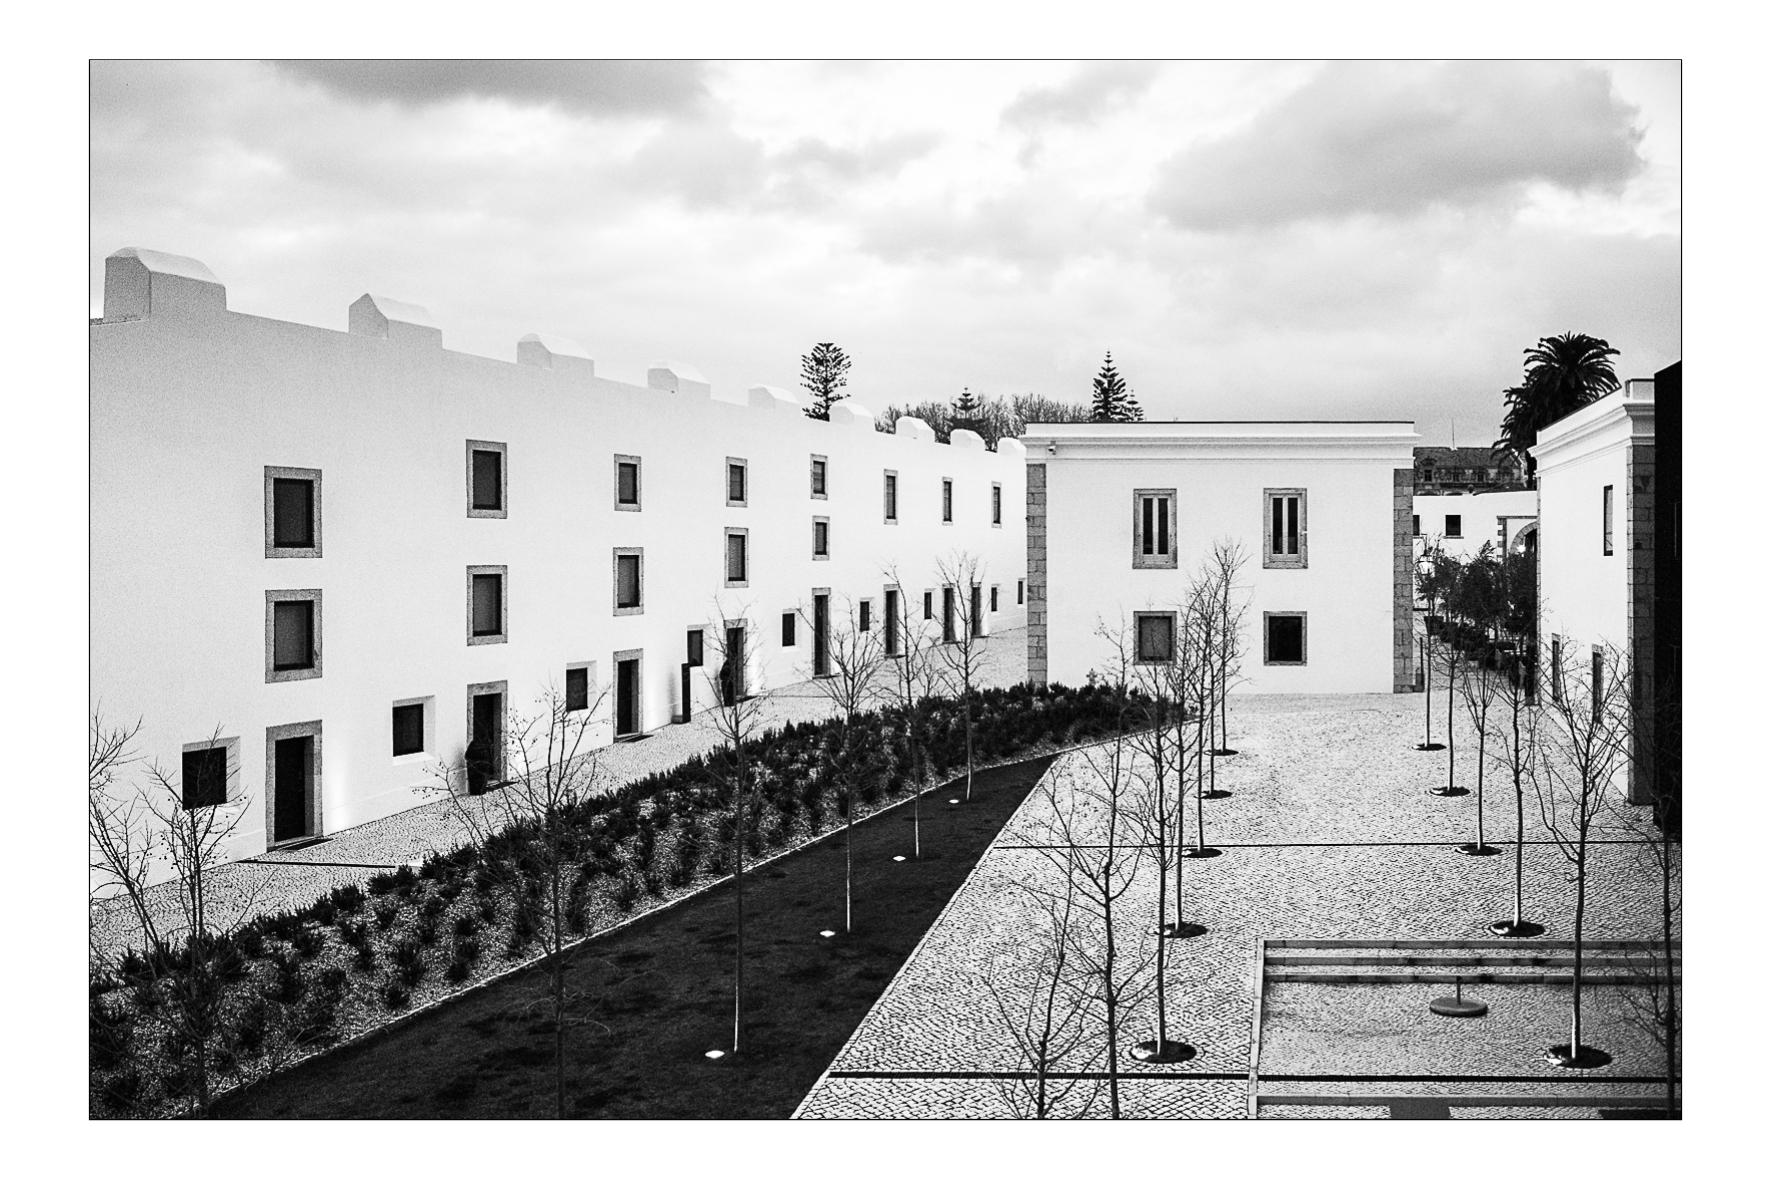 Pousada de Cascais, Portugal 2013.  Gonçalo Byrne and David Sinclair Architectes.